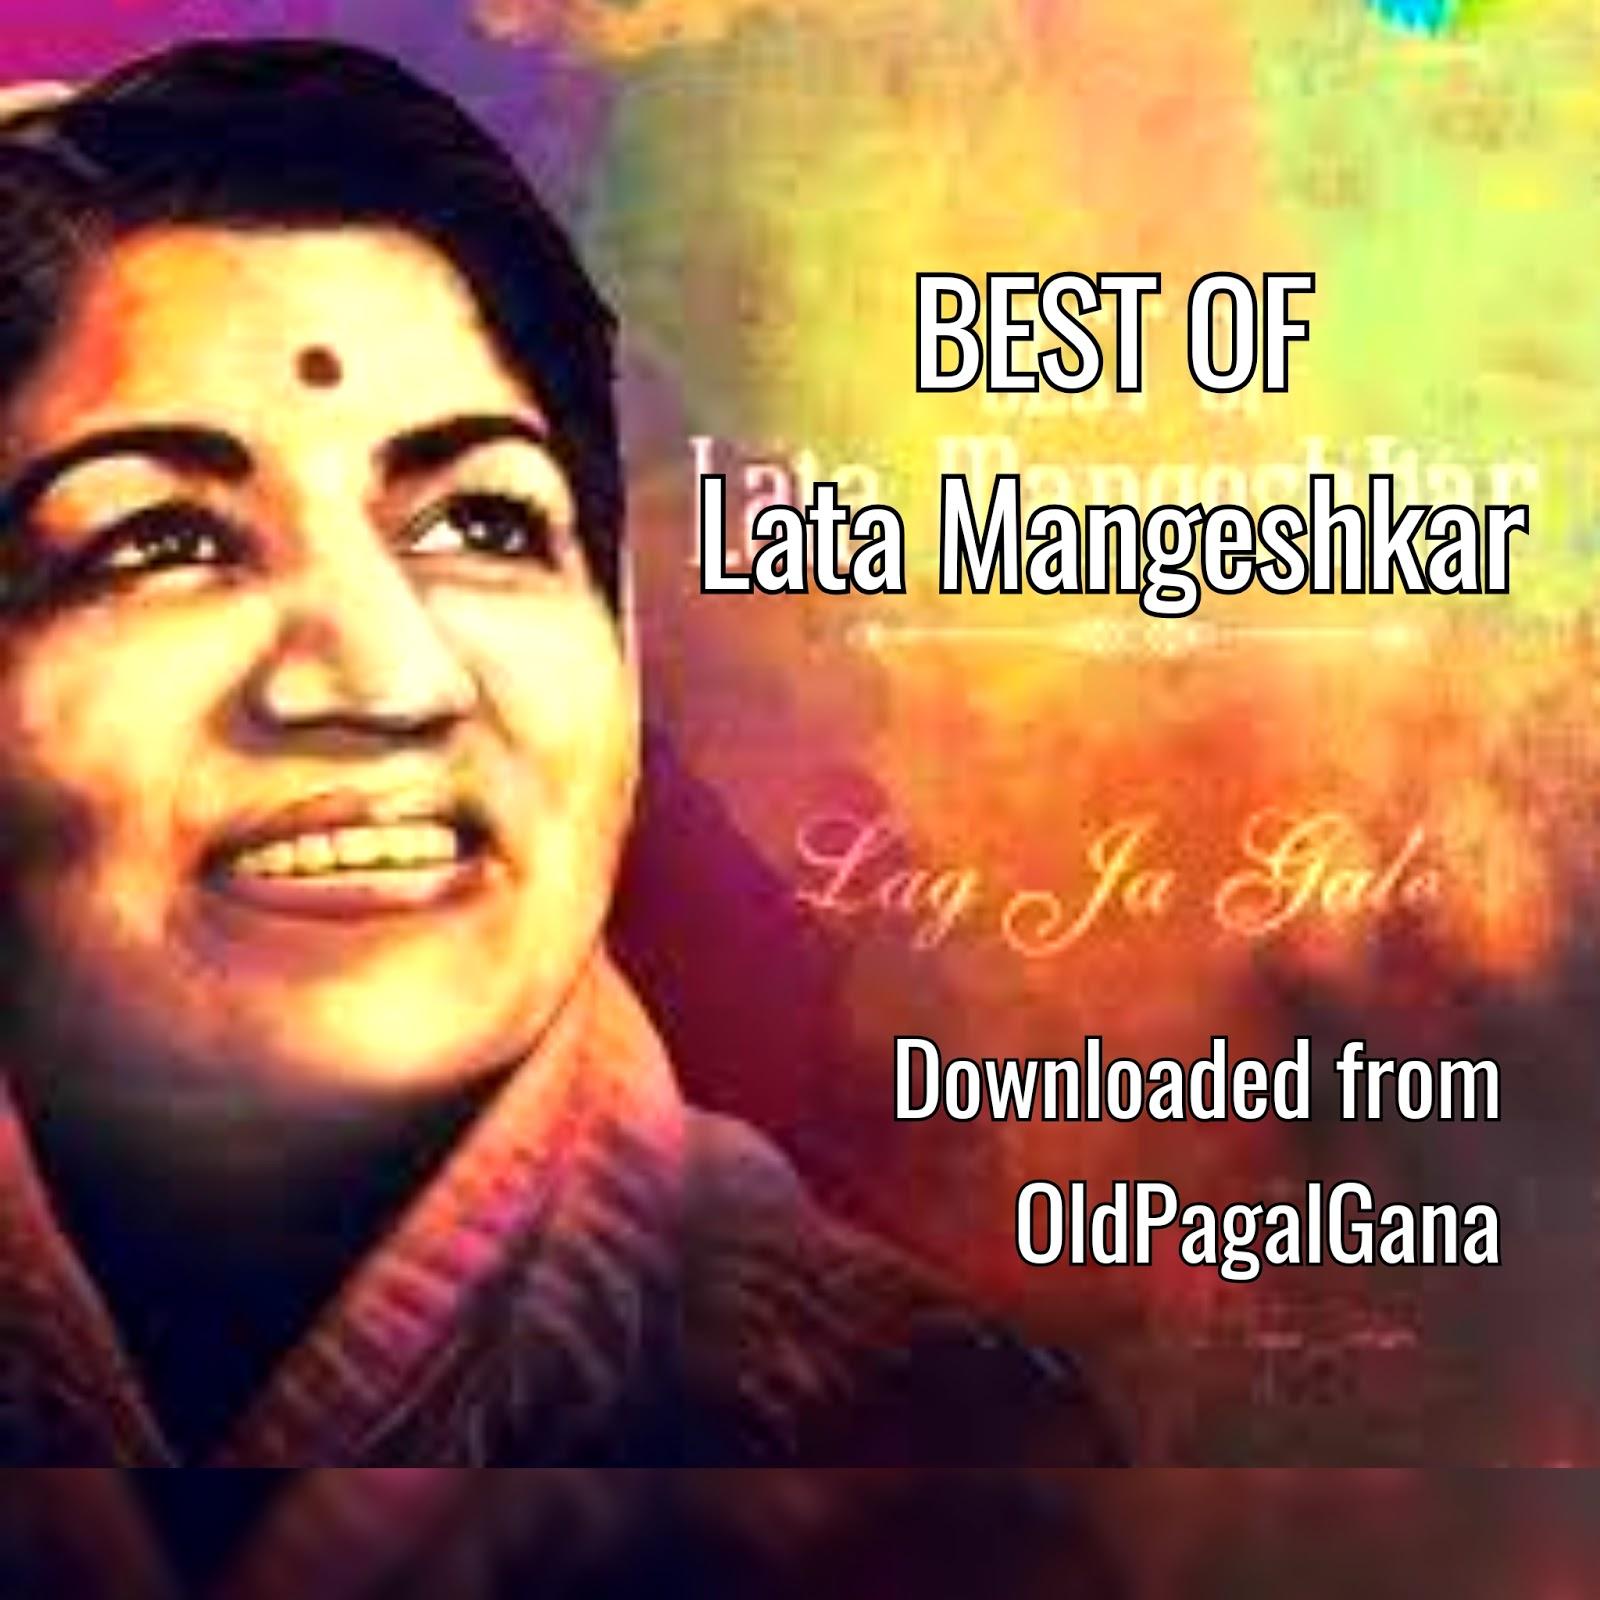 Best Of Lata Mangeshkar Mp3 Songs All Songs Free Downloads